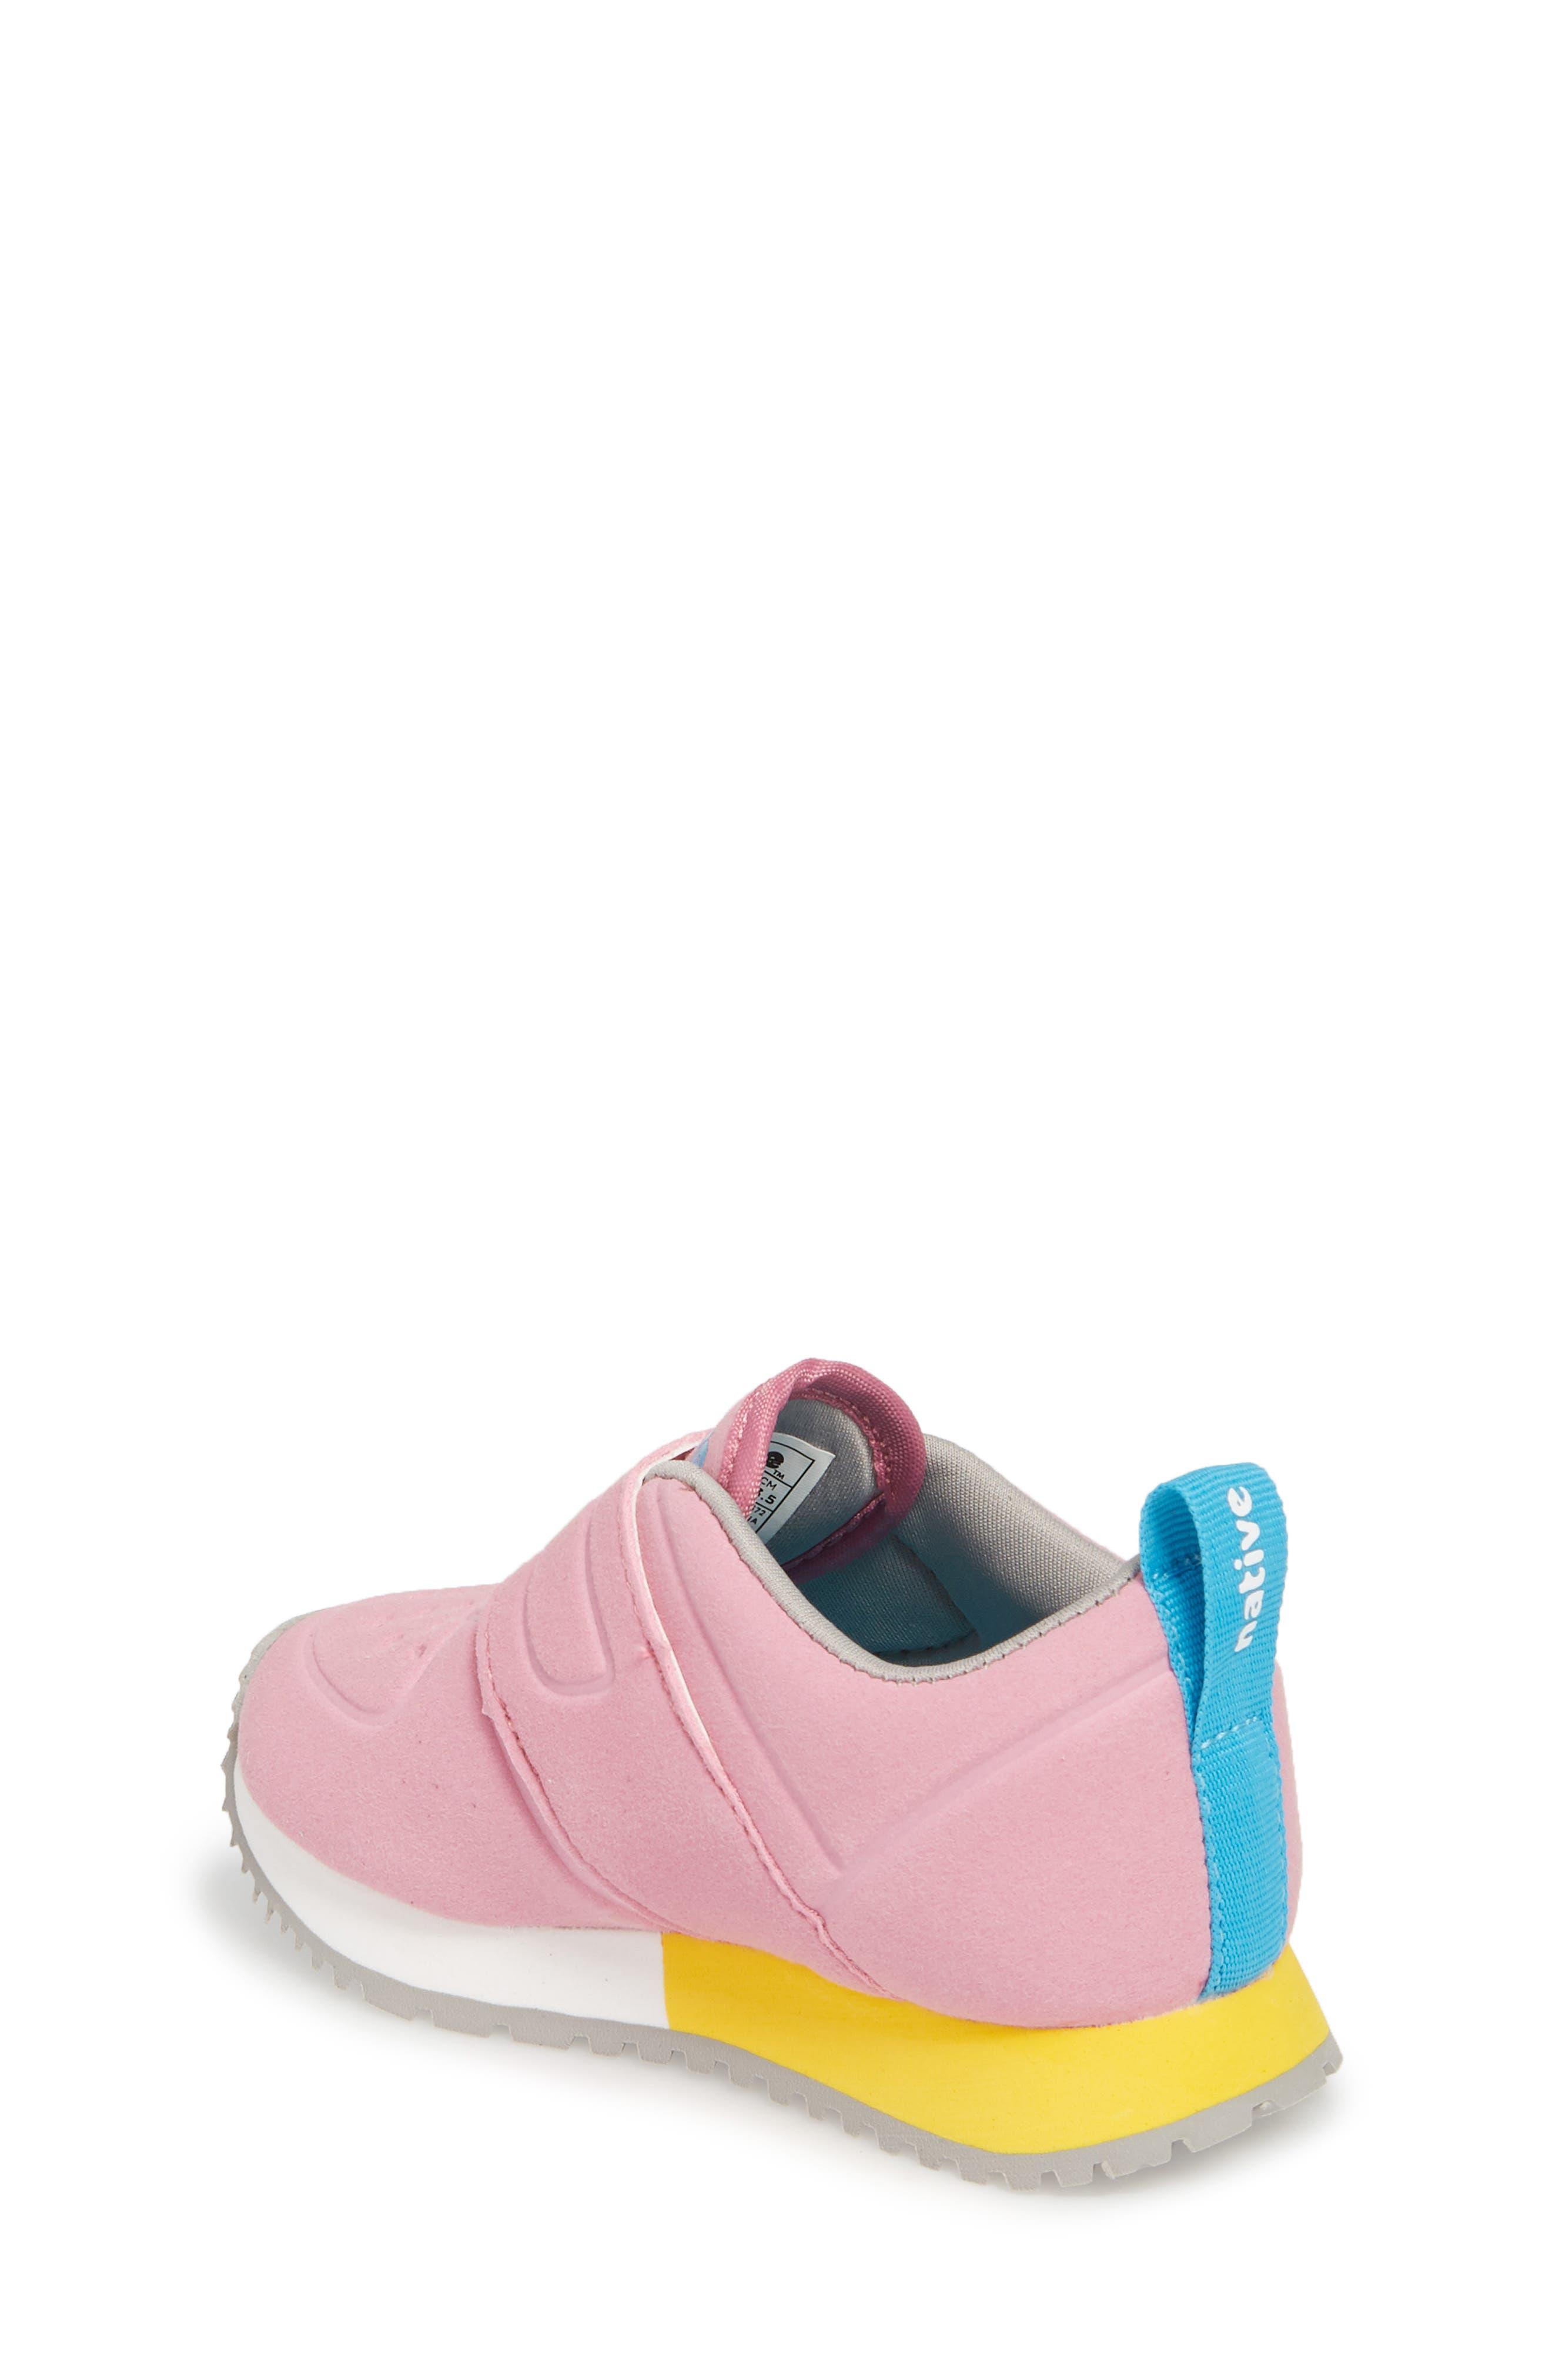 Native Cornell Perforated Sneaker,                             Alternate thumbnail 2, color,                             Malibu Pink/ White/ Blue